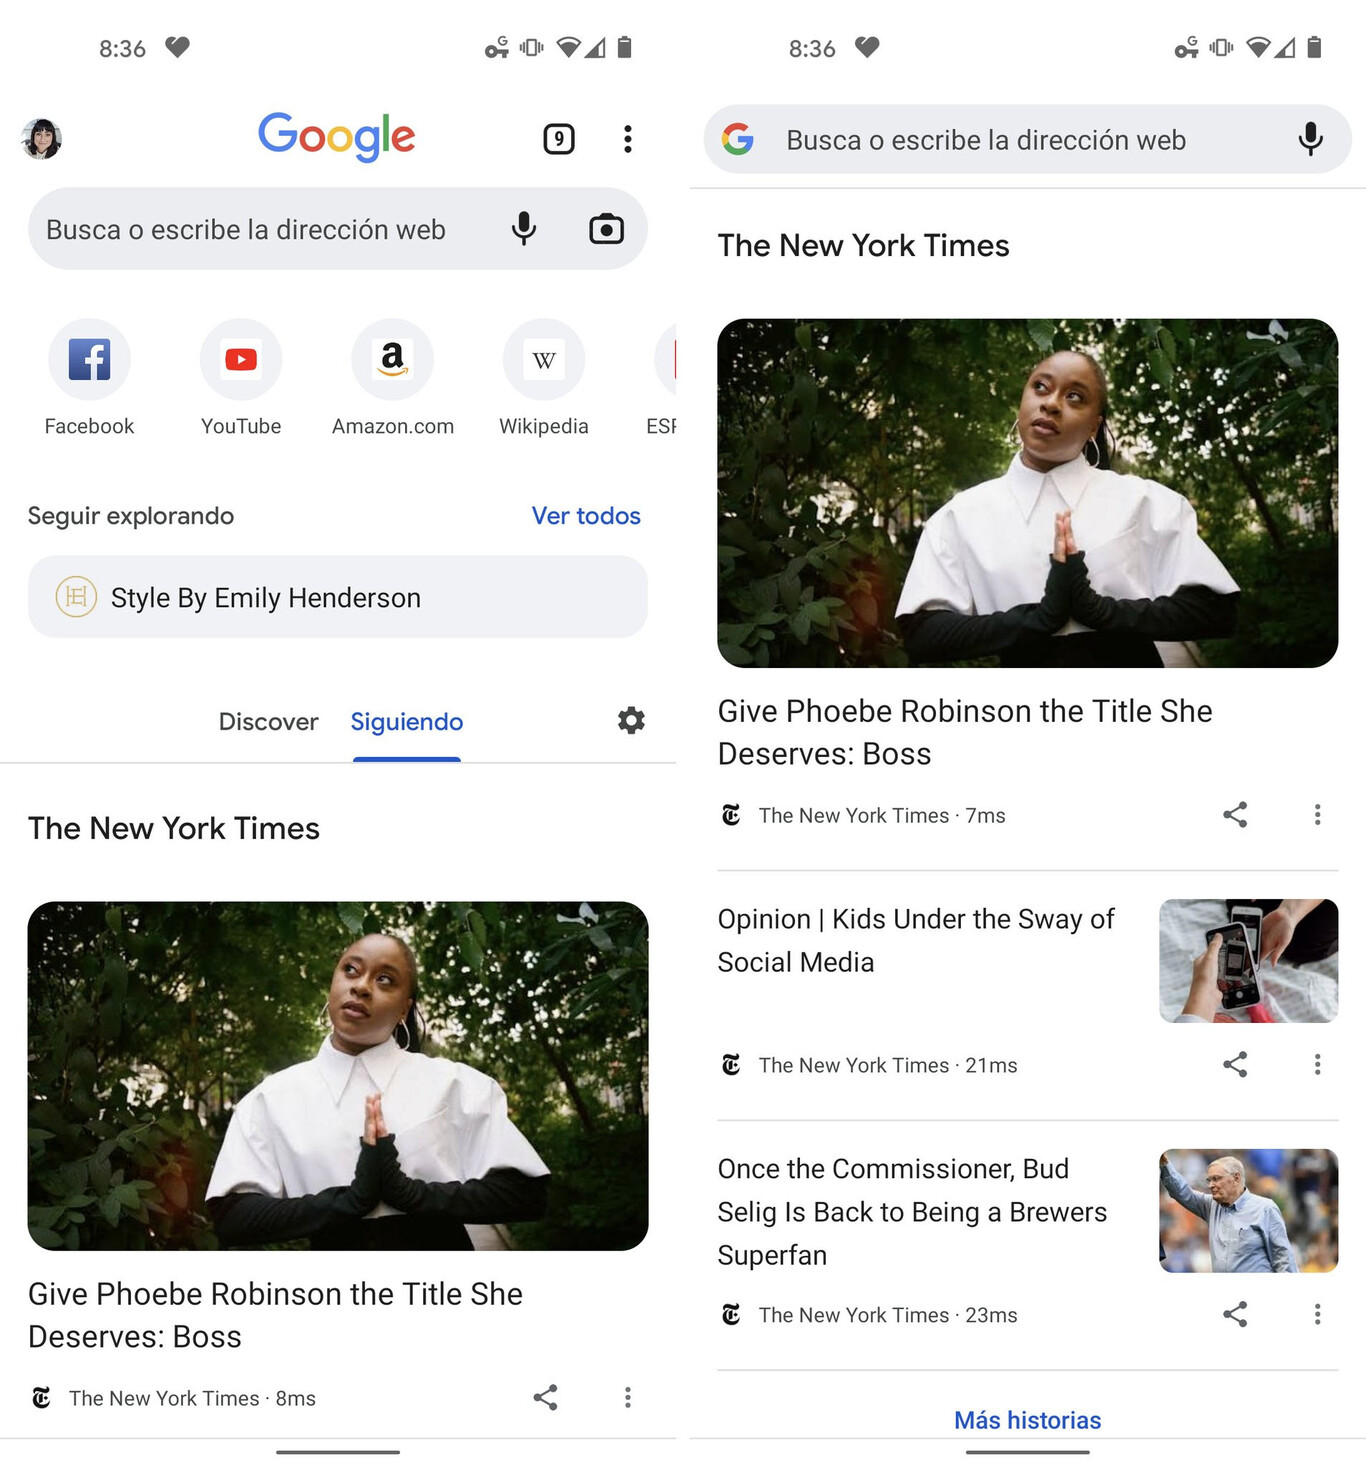 Google Chrome Rss Reader